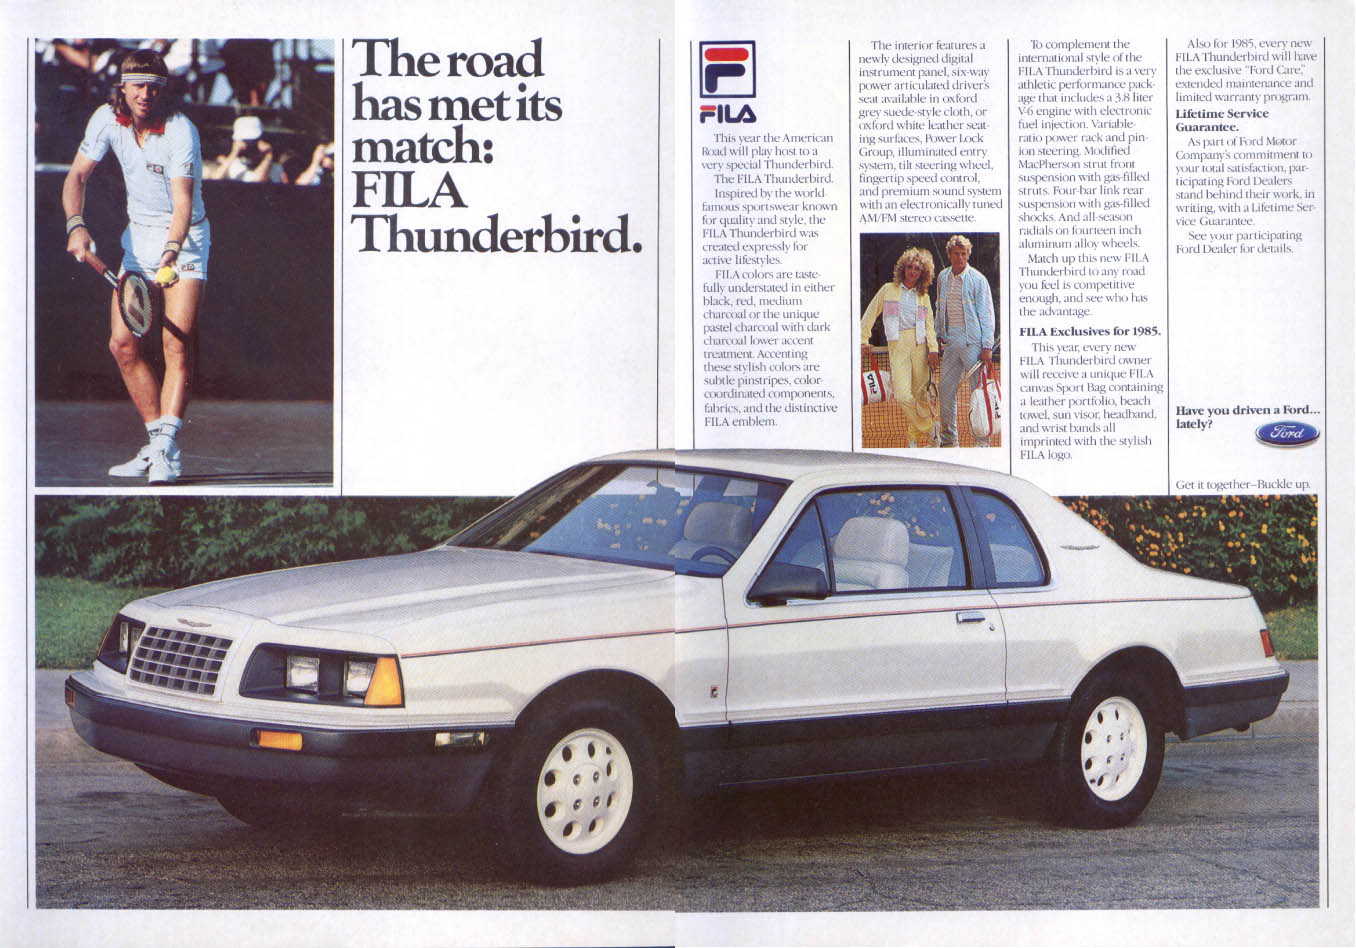 Image for Ford Thunderbird met its match Bjorn Borg FILA ad 1985